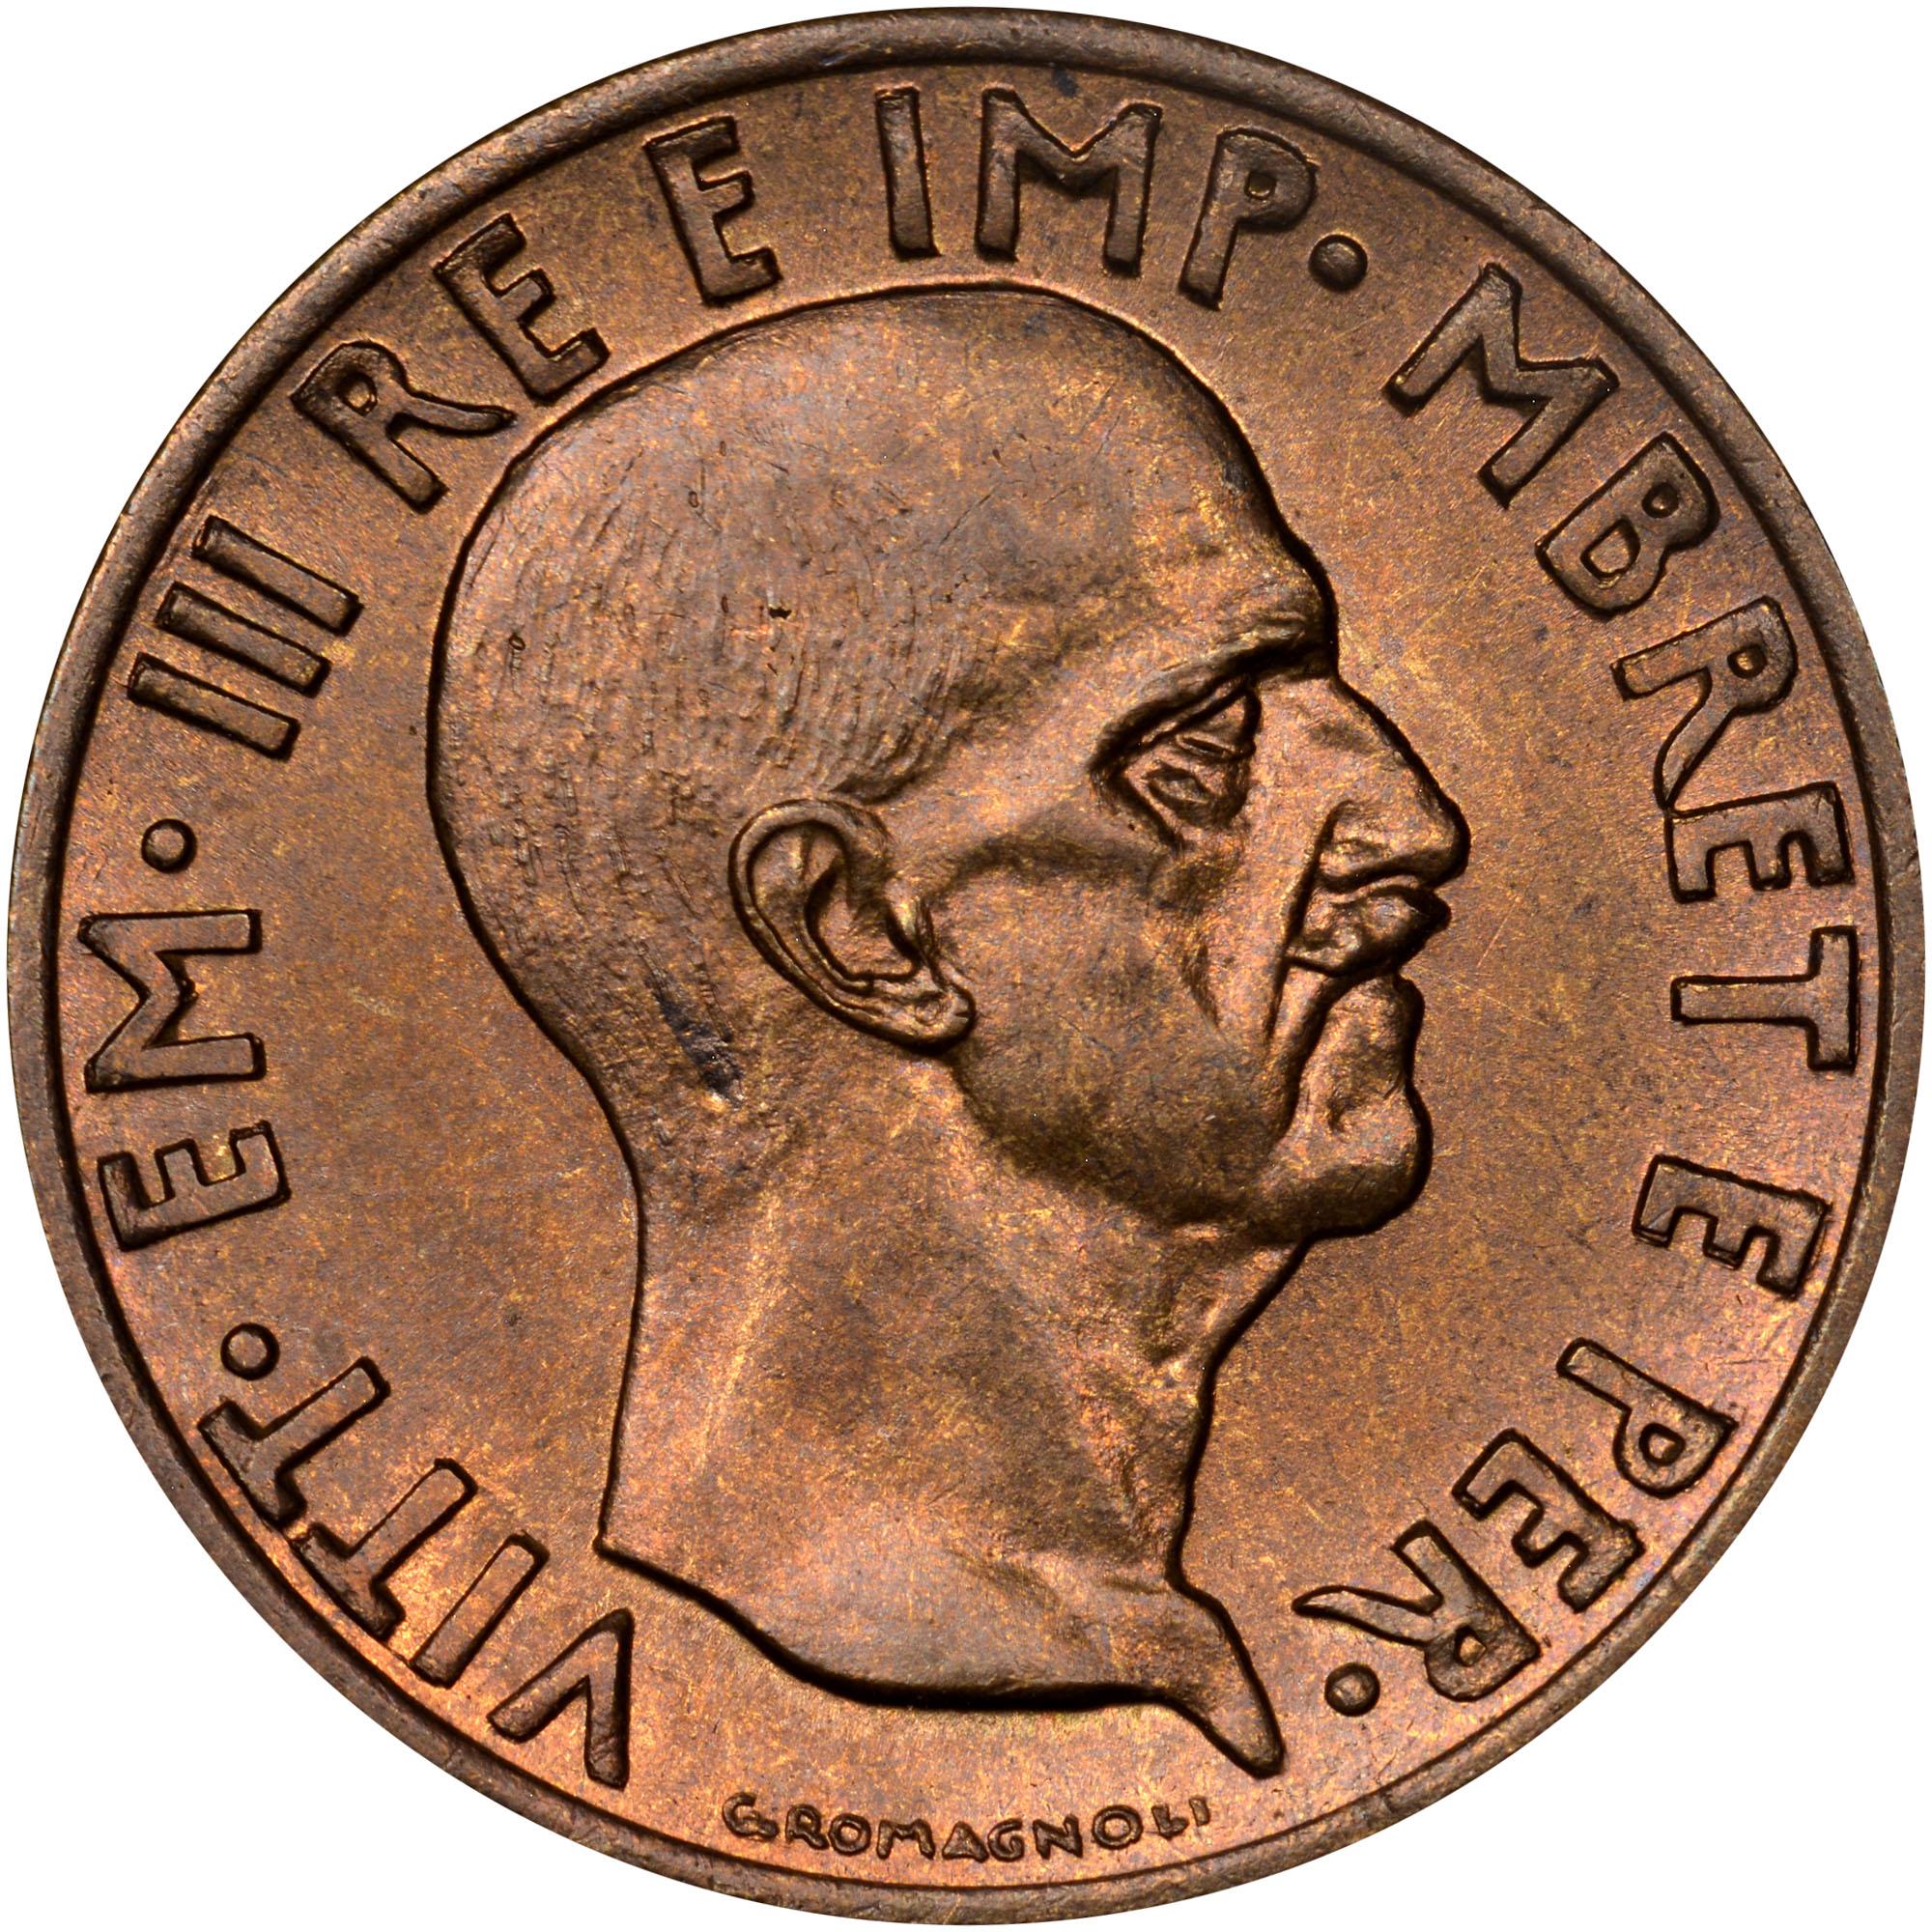 1940-1941 Albania 0.05 Lek obverse